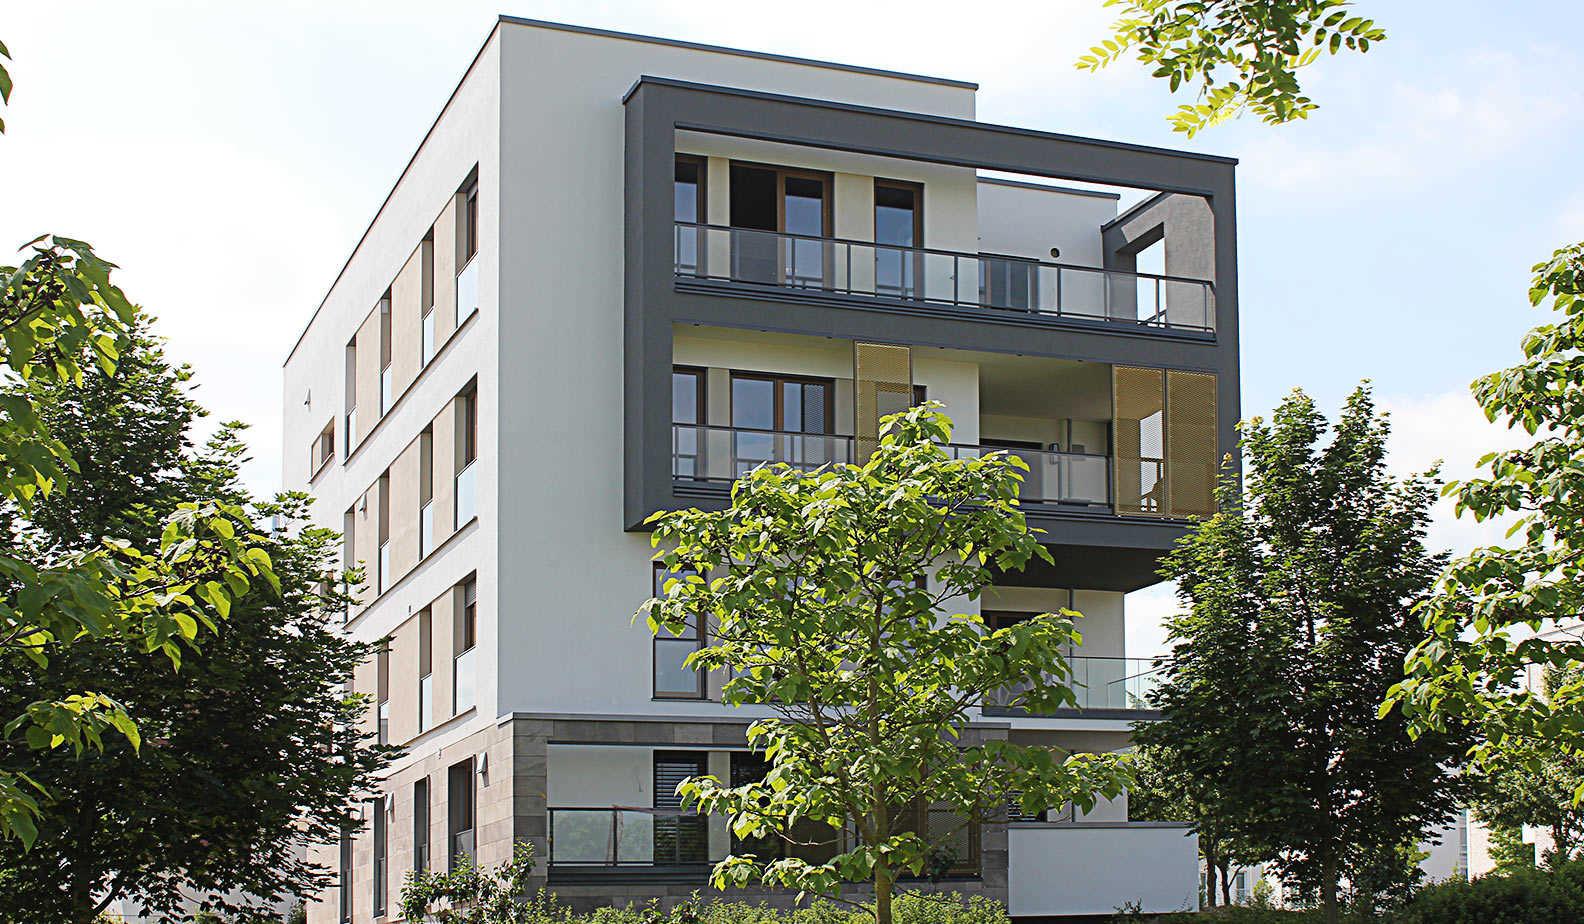 Architekturfarbe christian brandst dter projekt - Planquadrat architekten ...